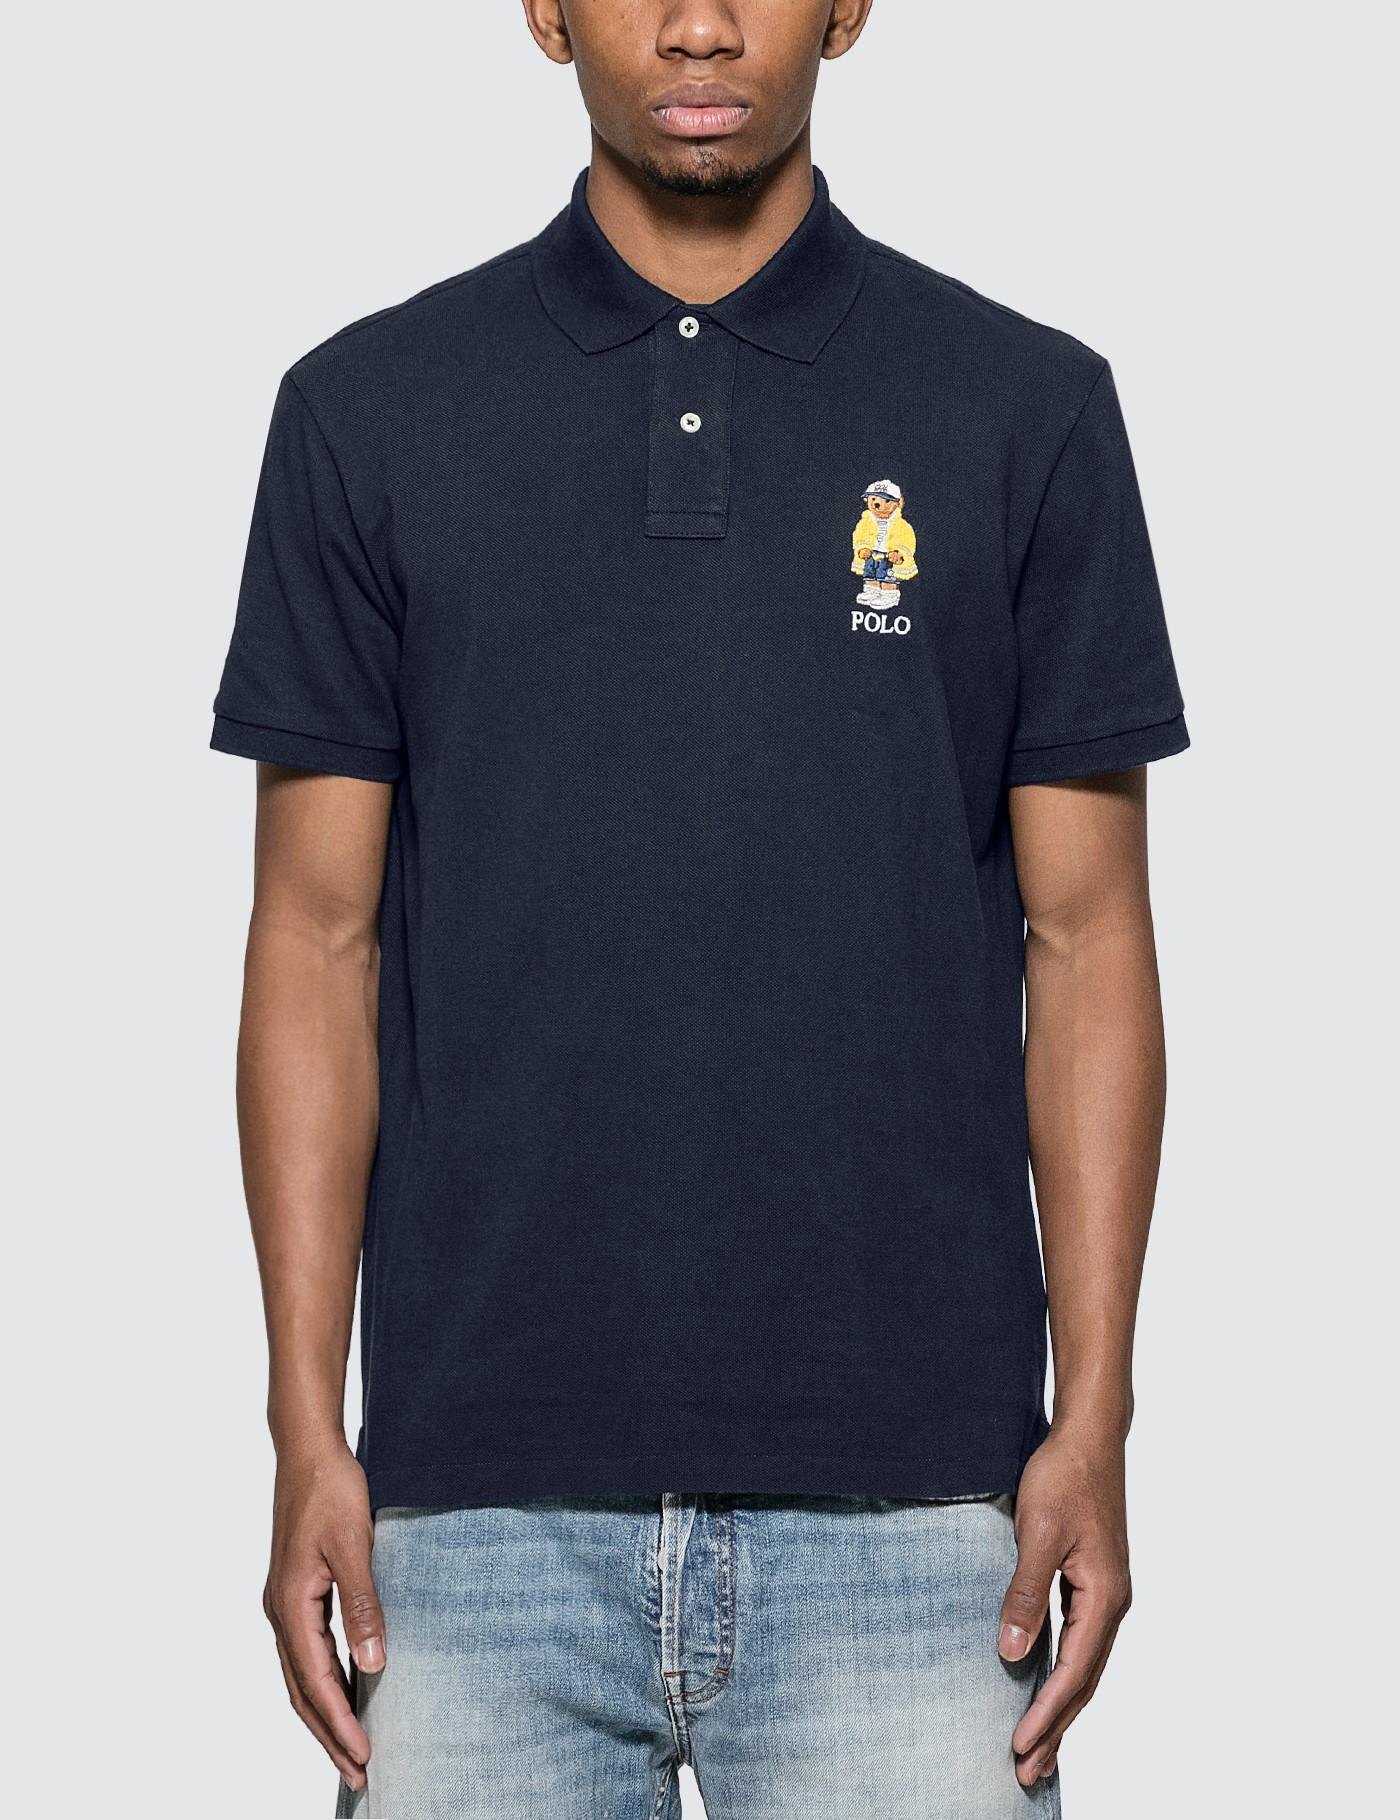 Polo Shirt With Embroidered Polo Bear